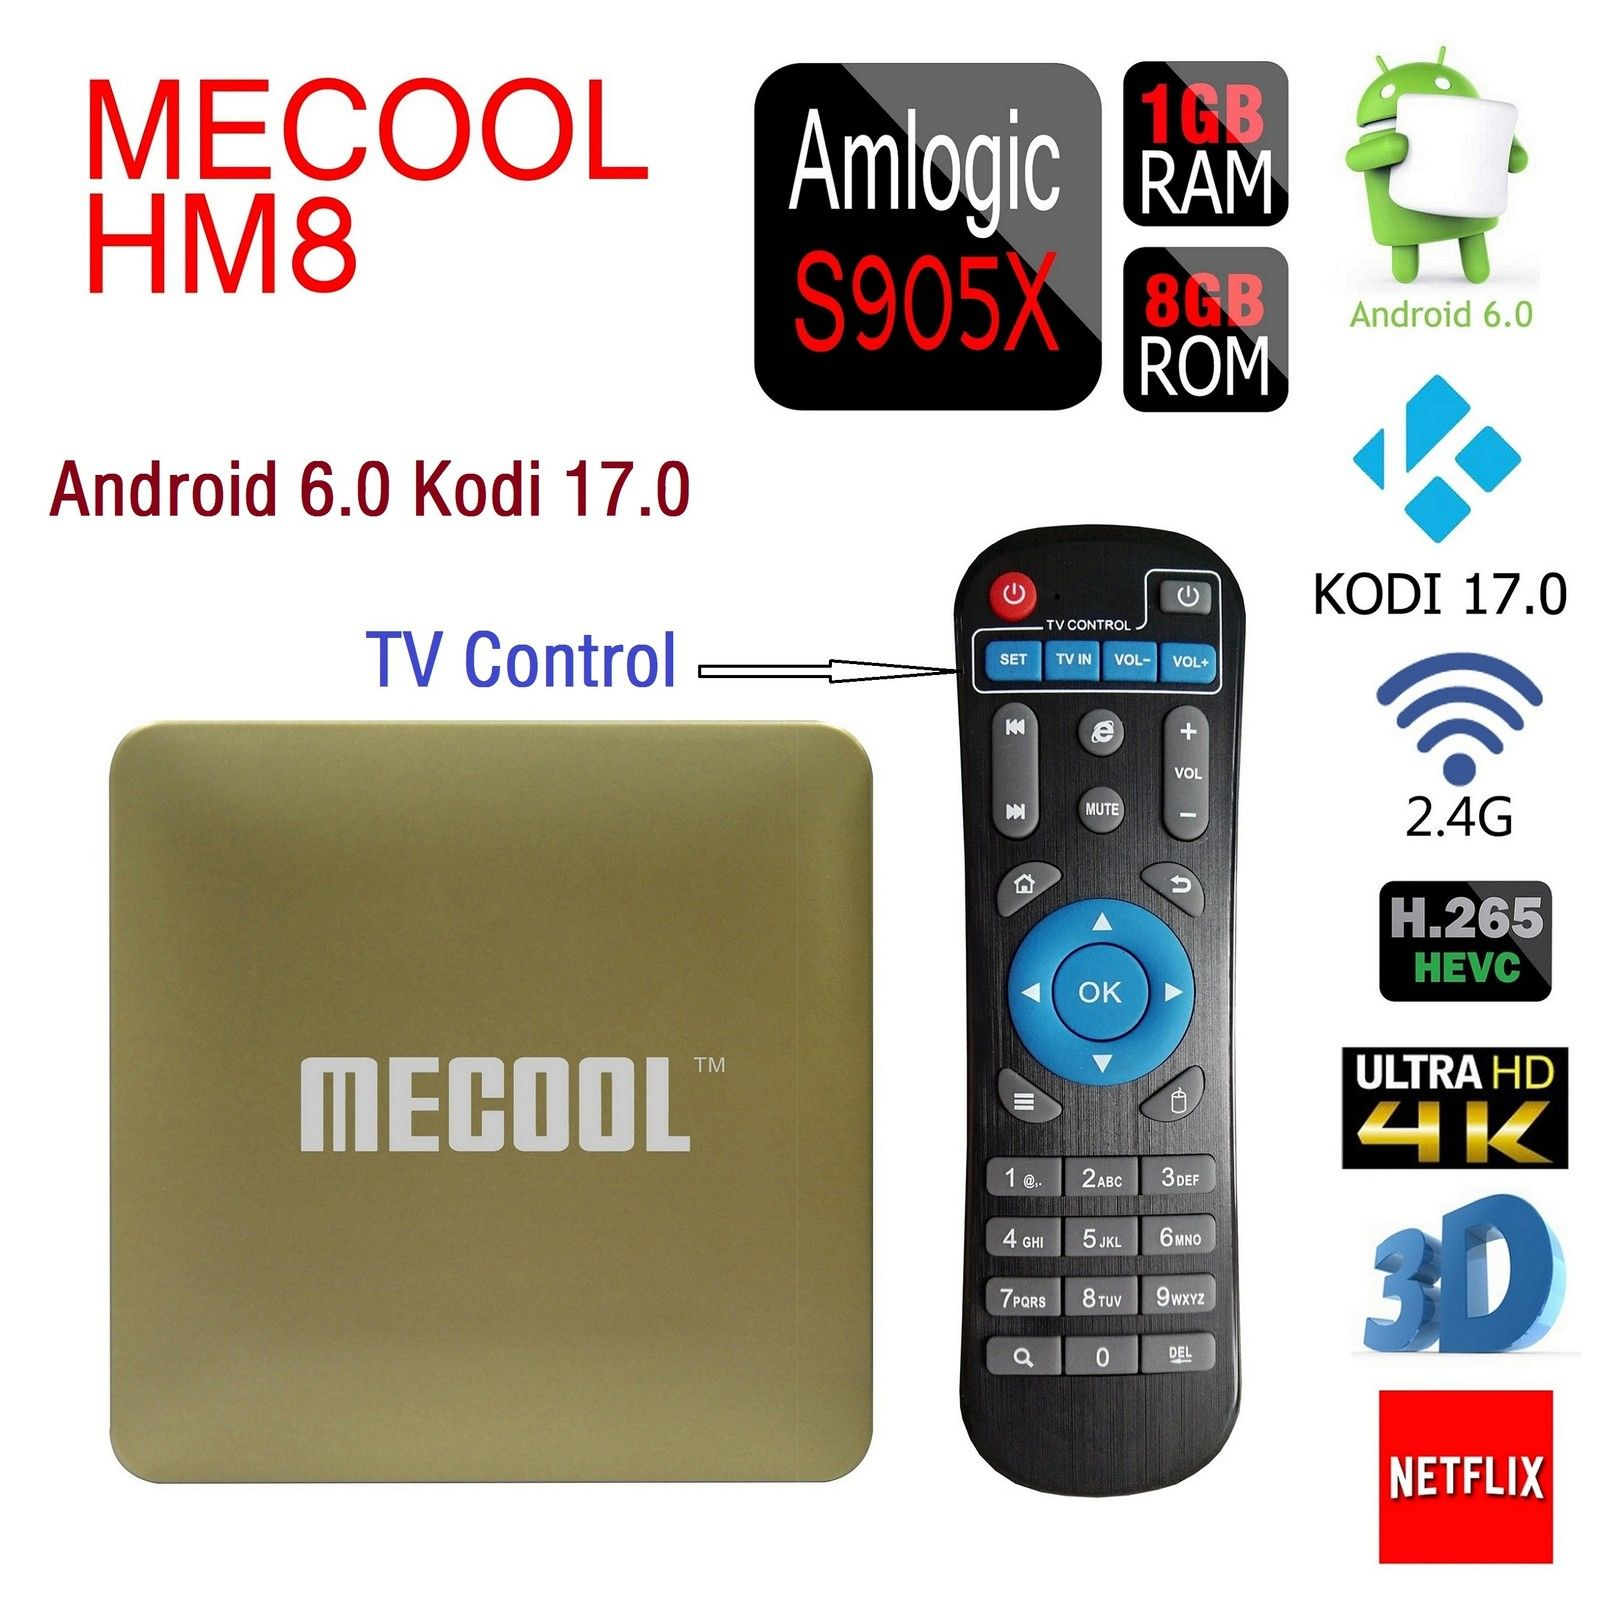 AKASO  HM8 TV Box Amlogic S905X Quad Core 64 Bit Android 6.0  Kodi 17.0 VP9 Profile Smart Mini PC 1GB+8GB 4K TV Set Top Box wifi himedia q10 hot hi3798cv200 quad core 64 bit android tv box smart tv iptv 3 5 hdd dts ac3 player 2g 16g kodi 2 4 5g wifi bt4